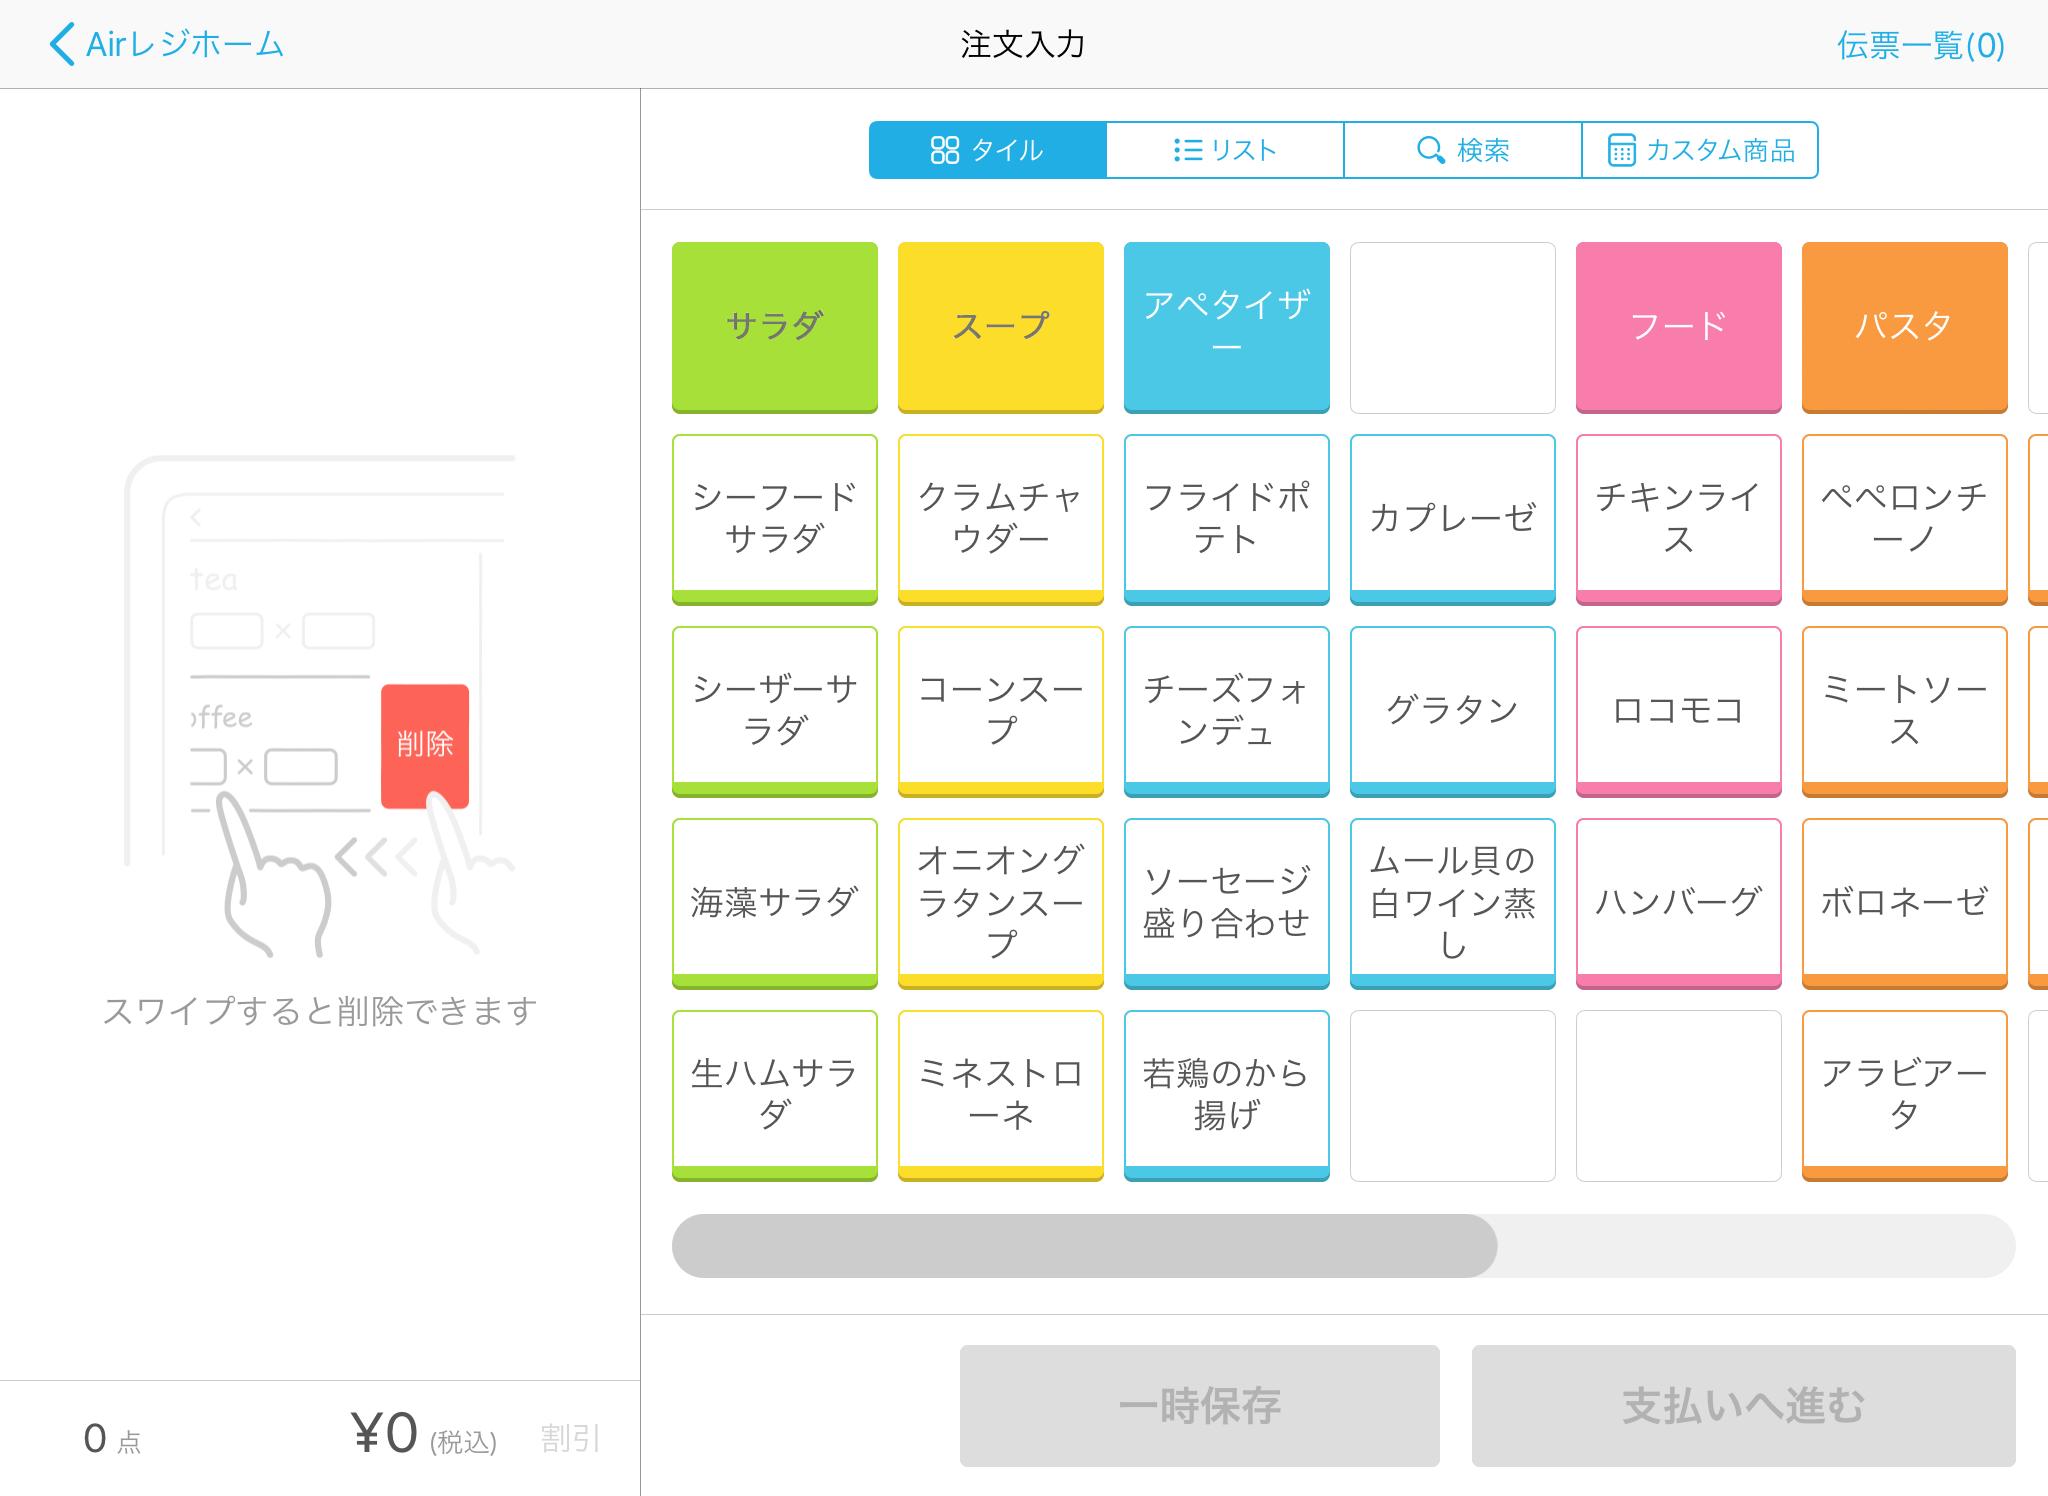 Airレジ 注文入力画面(タイル表示)